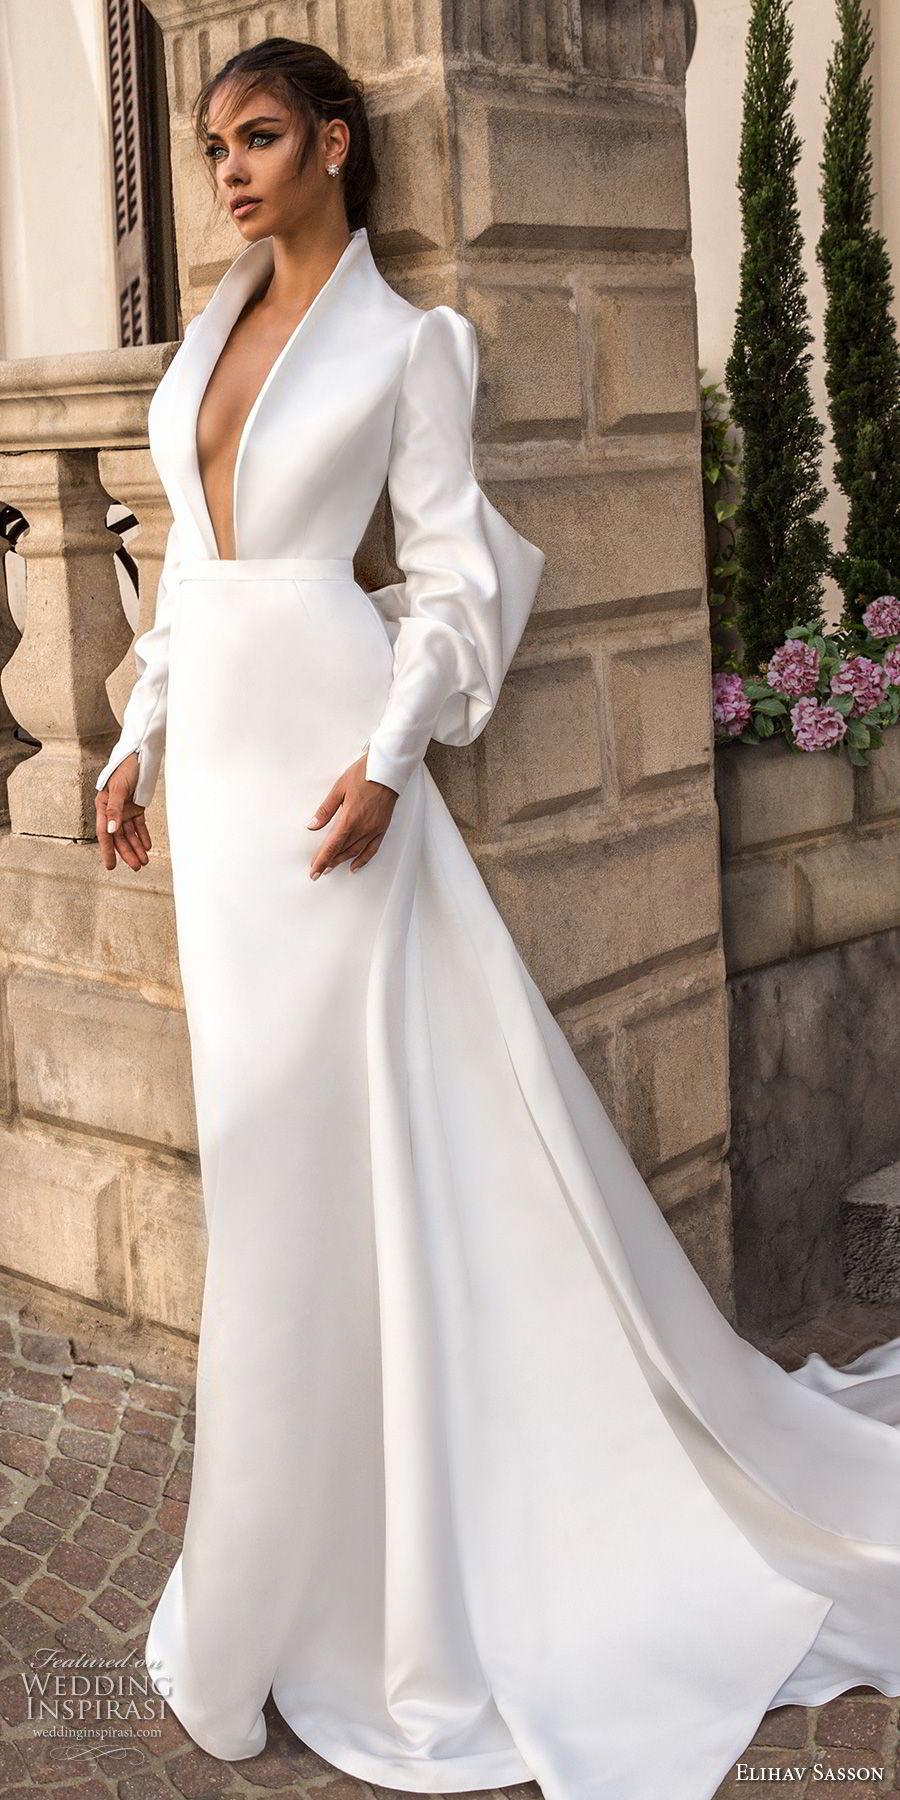 10 Ways Meghan Markle\'s Royal Wedding Dress Choice Might Surprise Us ...